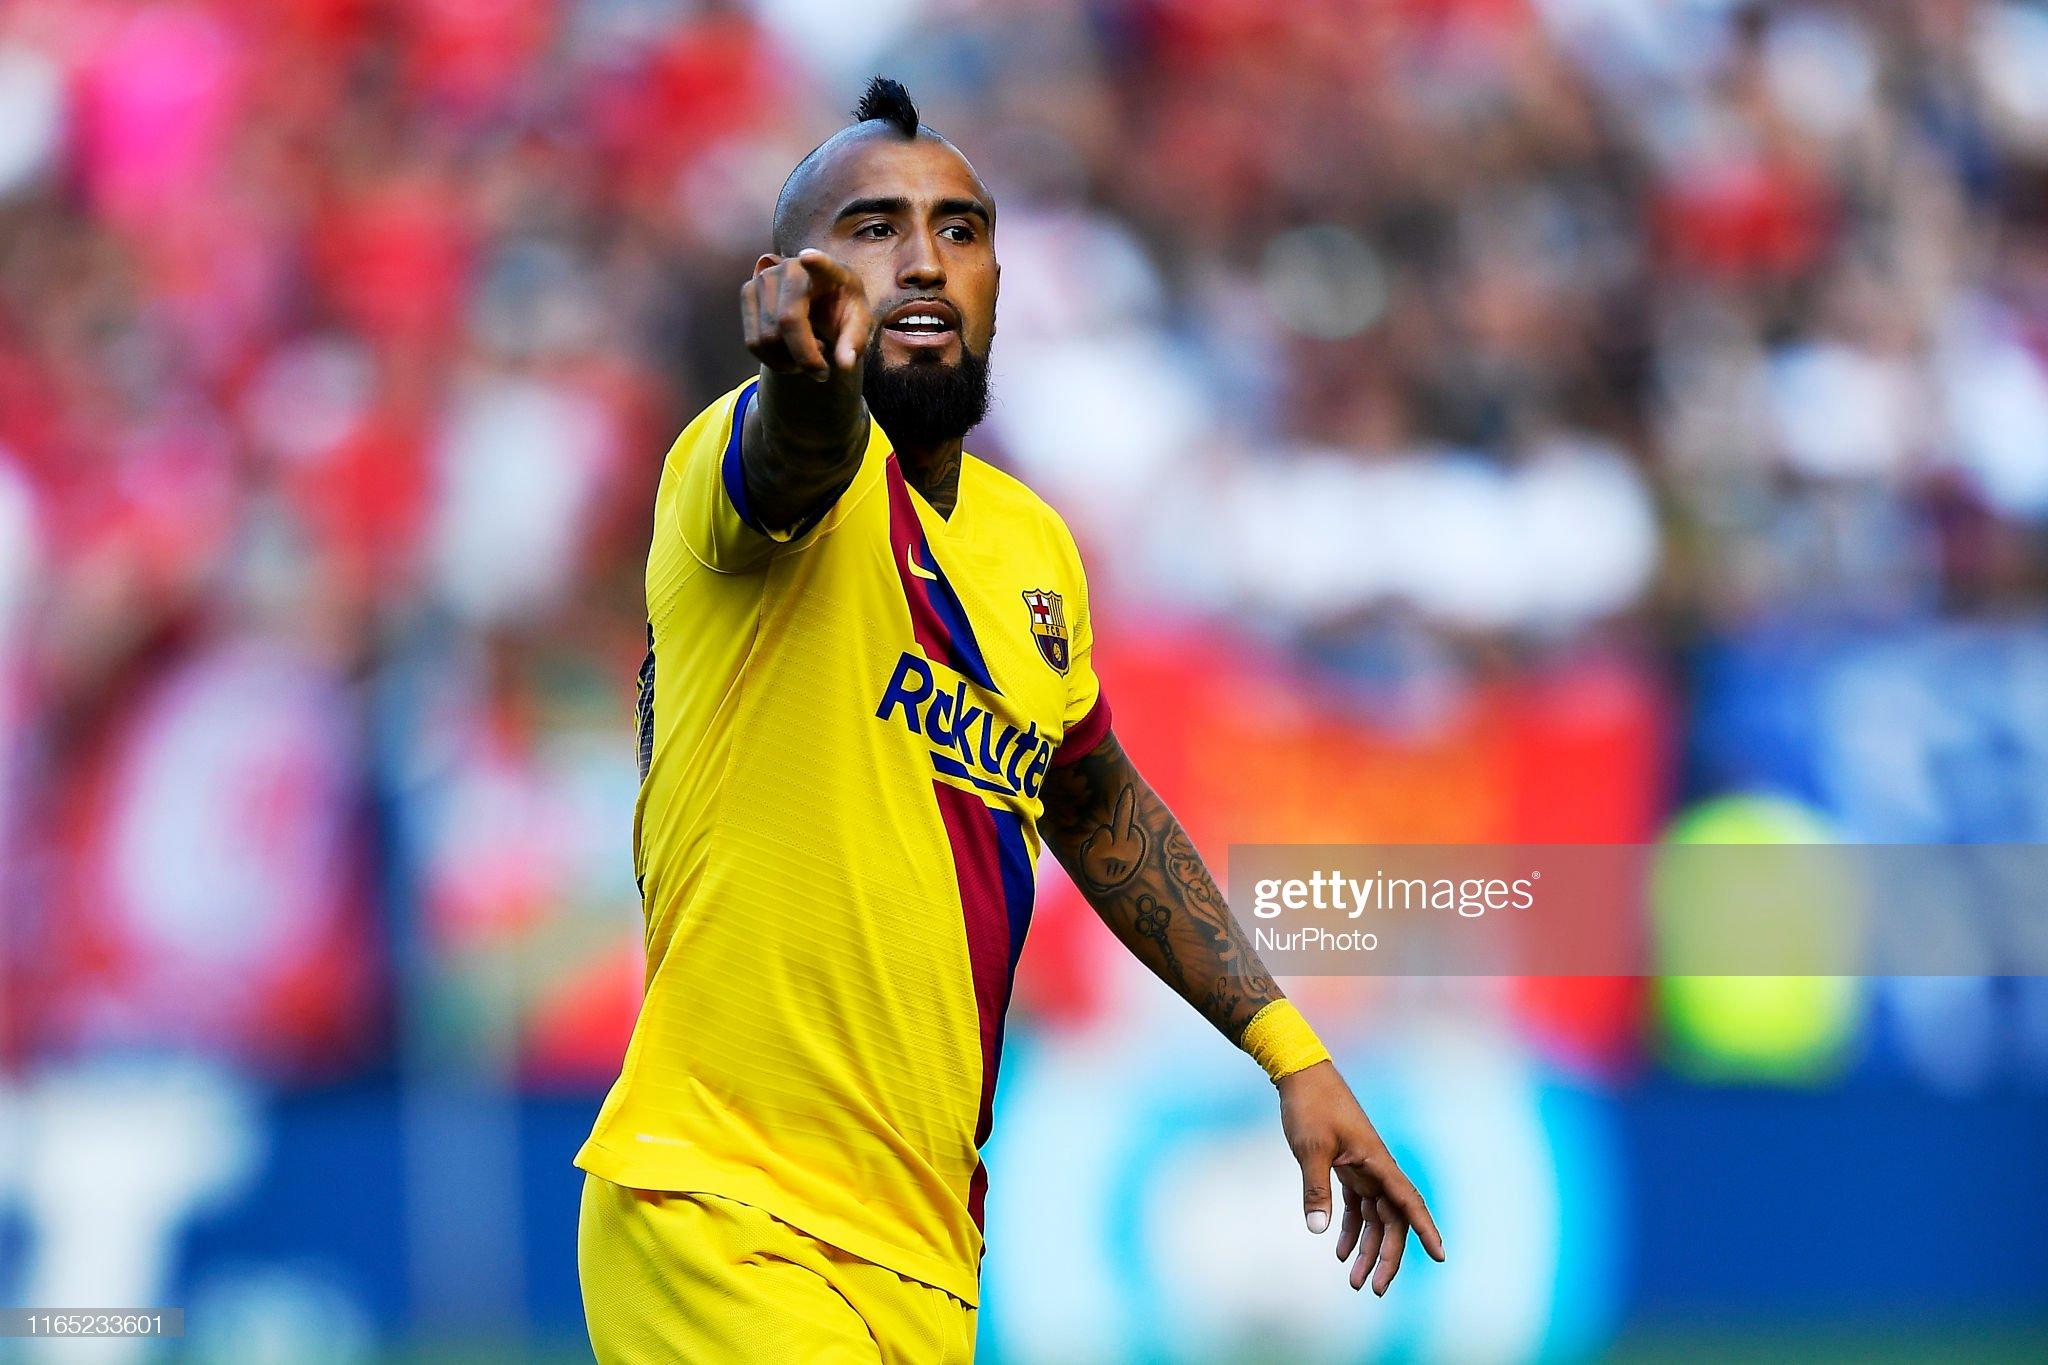 صور مباراة : أوساسونا - برشلونة 2-2 ( 31-08-2019 )  Arturo-vidal-of-barcelona-gives-instructions-during-the-liga-match-picture-id1165233601?s=2048x2048